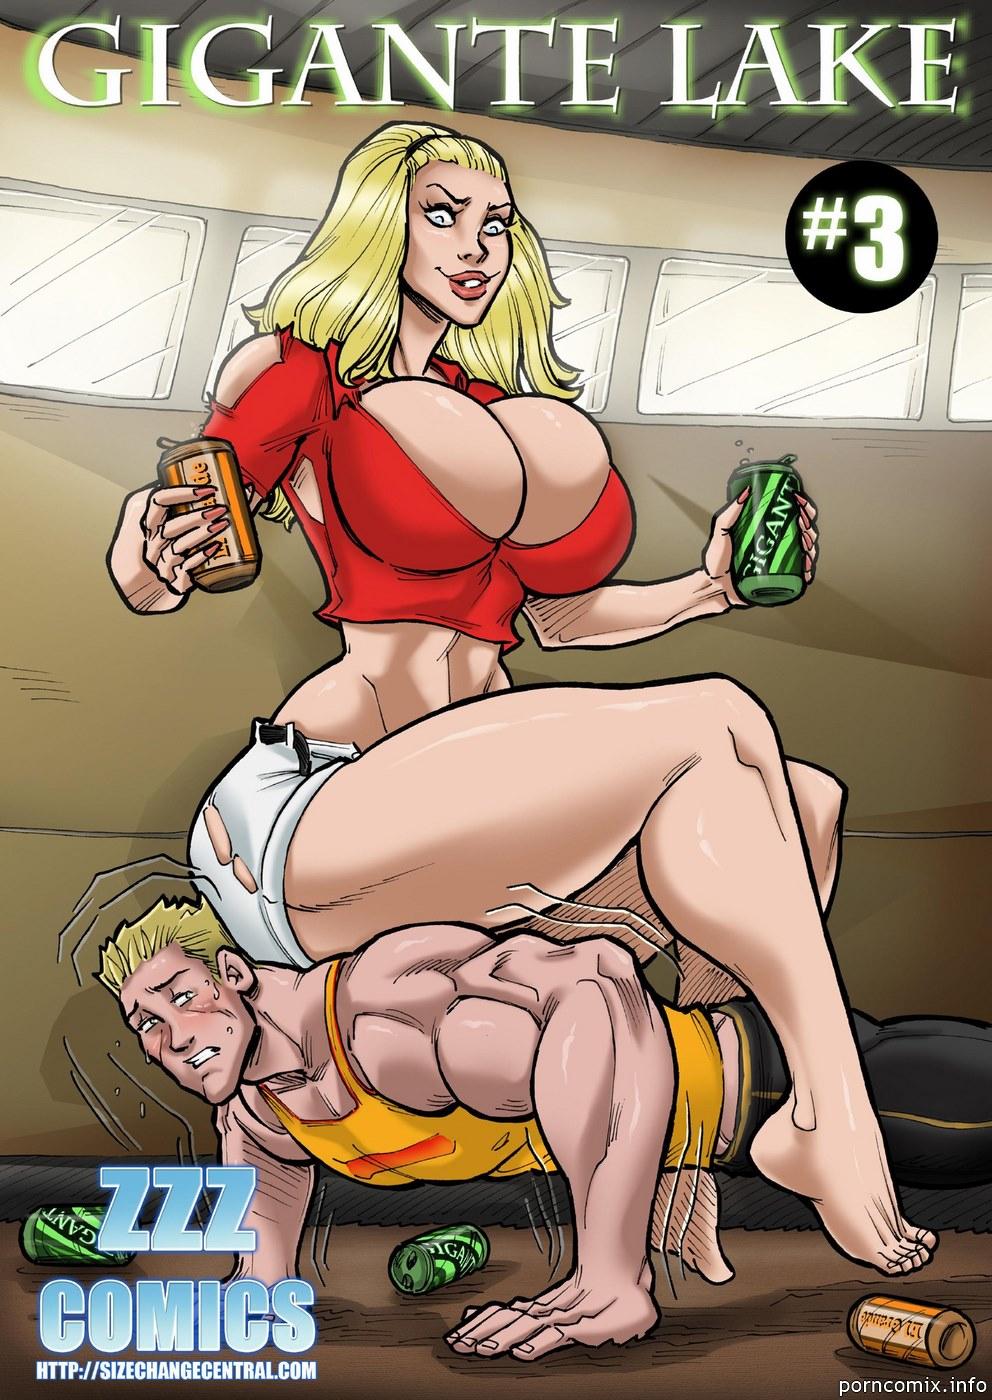 Porn Comics - Gigante Lake 3 porn comics 8 muses